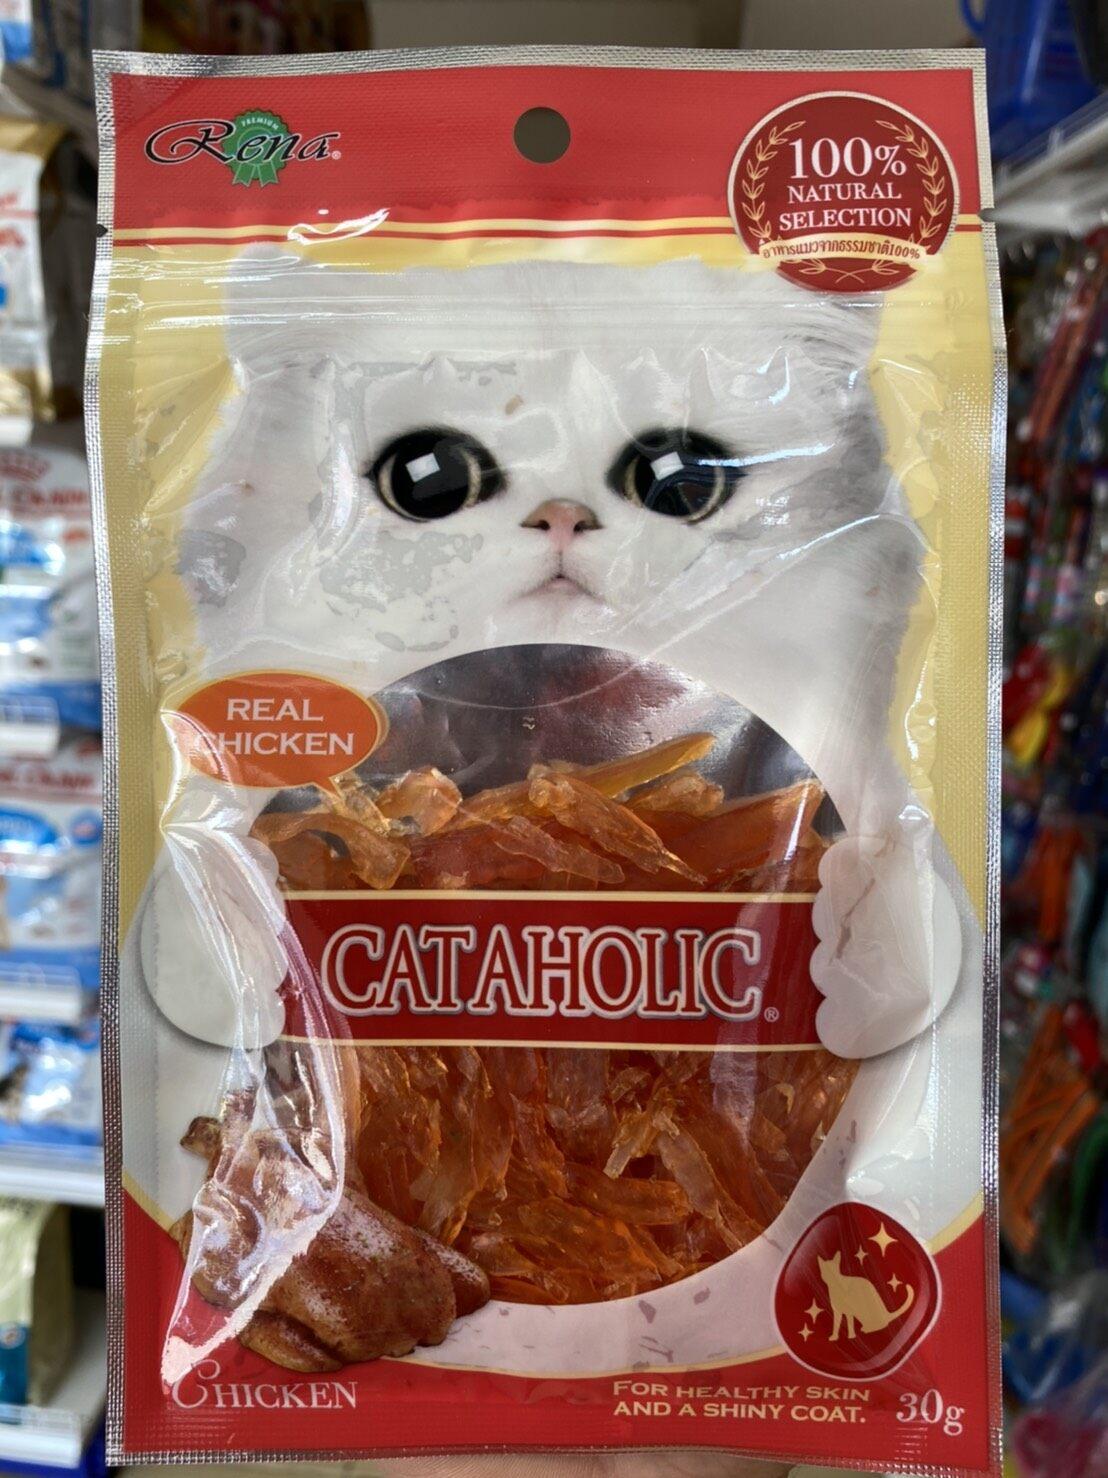 Cat Treat ขนมแมว Cataholic รสไก่สไลด์ Chicken แมวชอบอร่อยมาก.